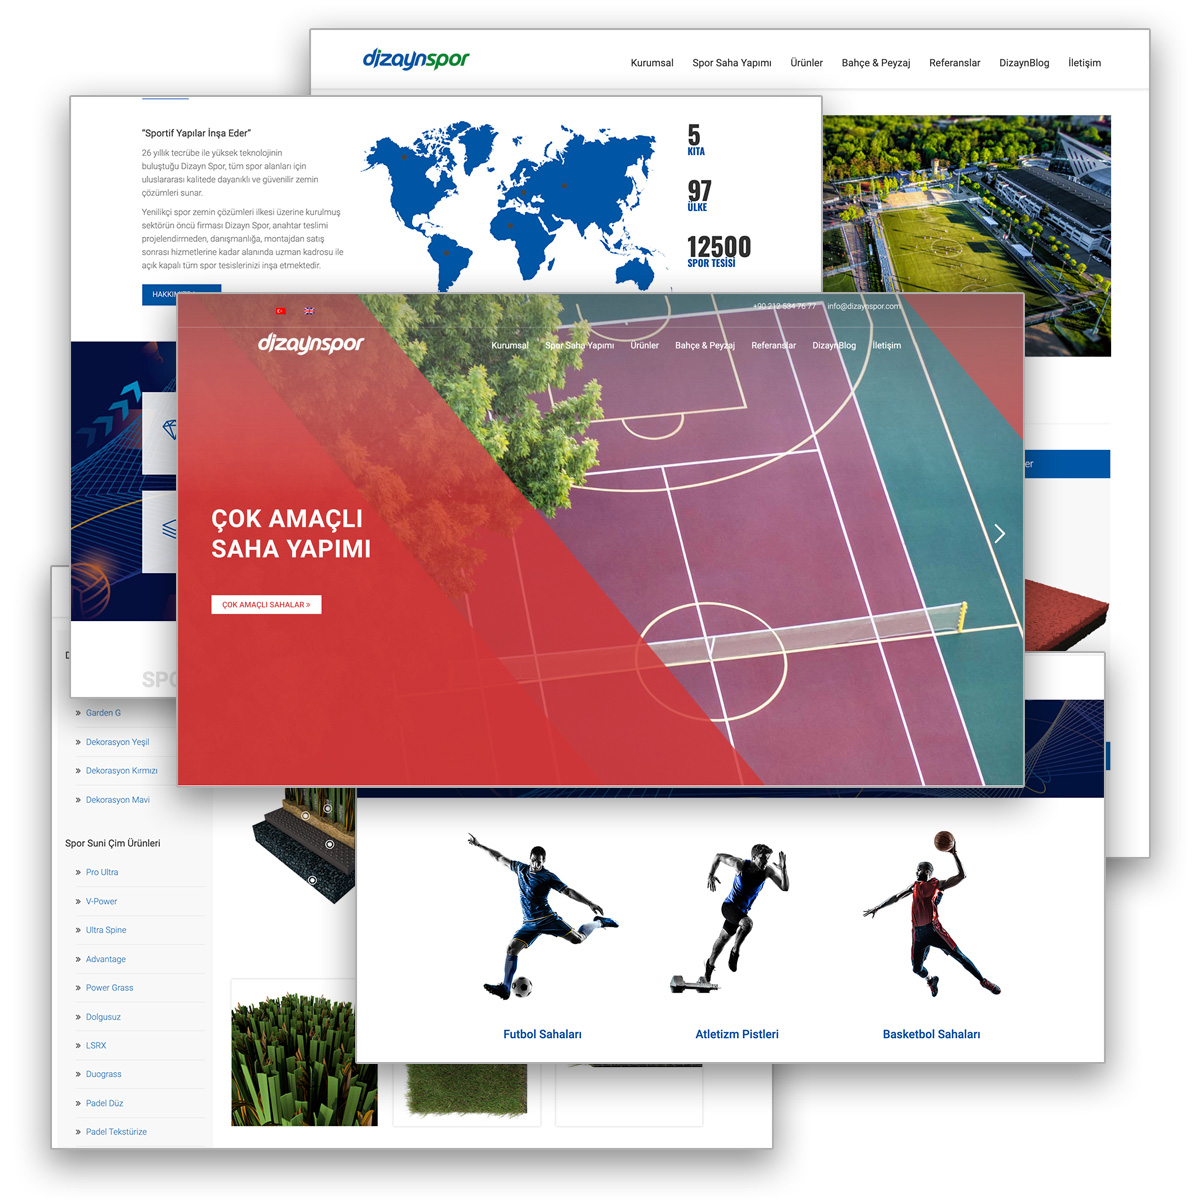 dizaynspor website s